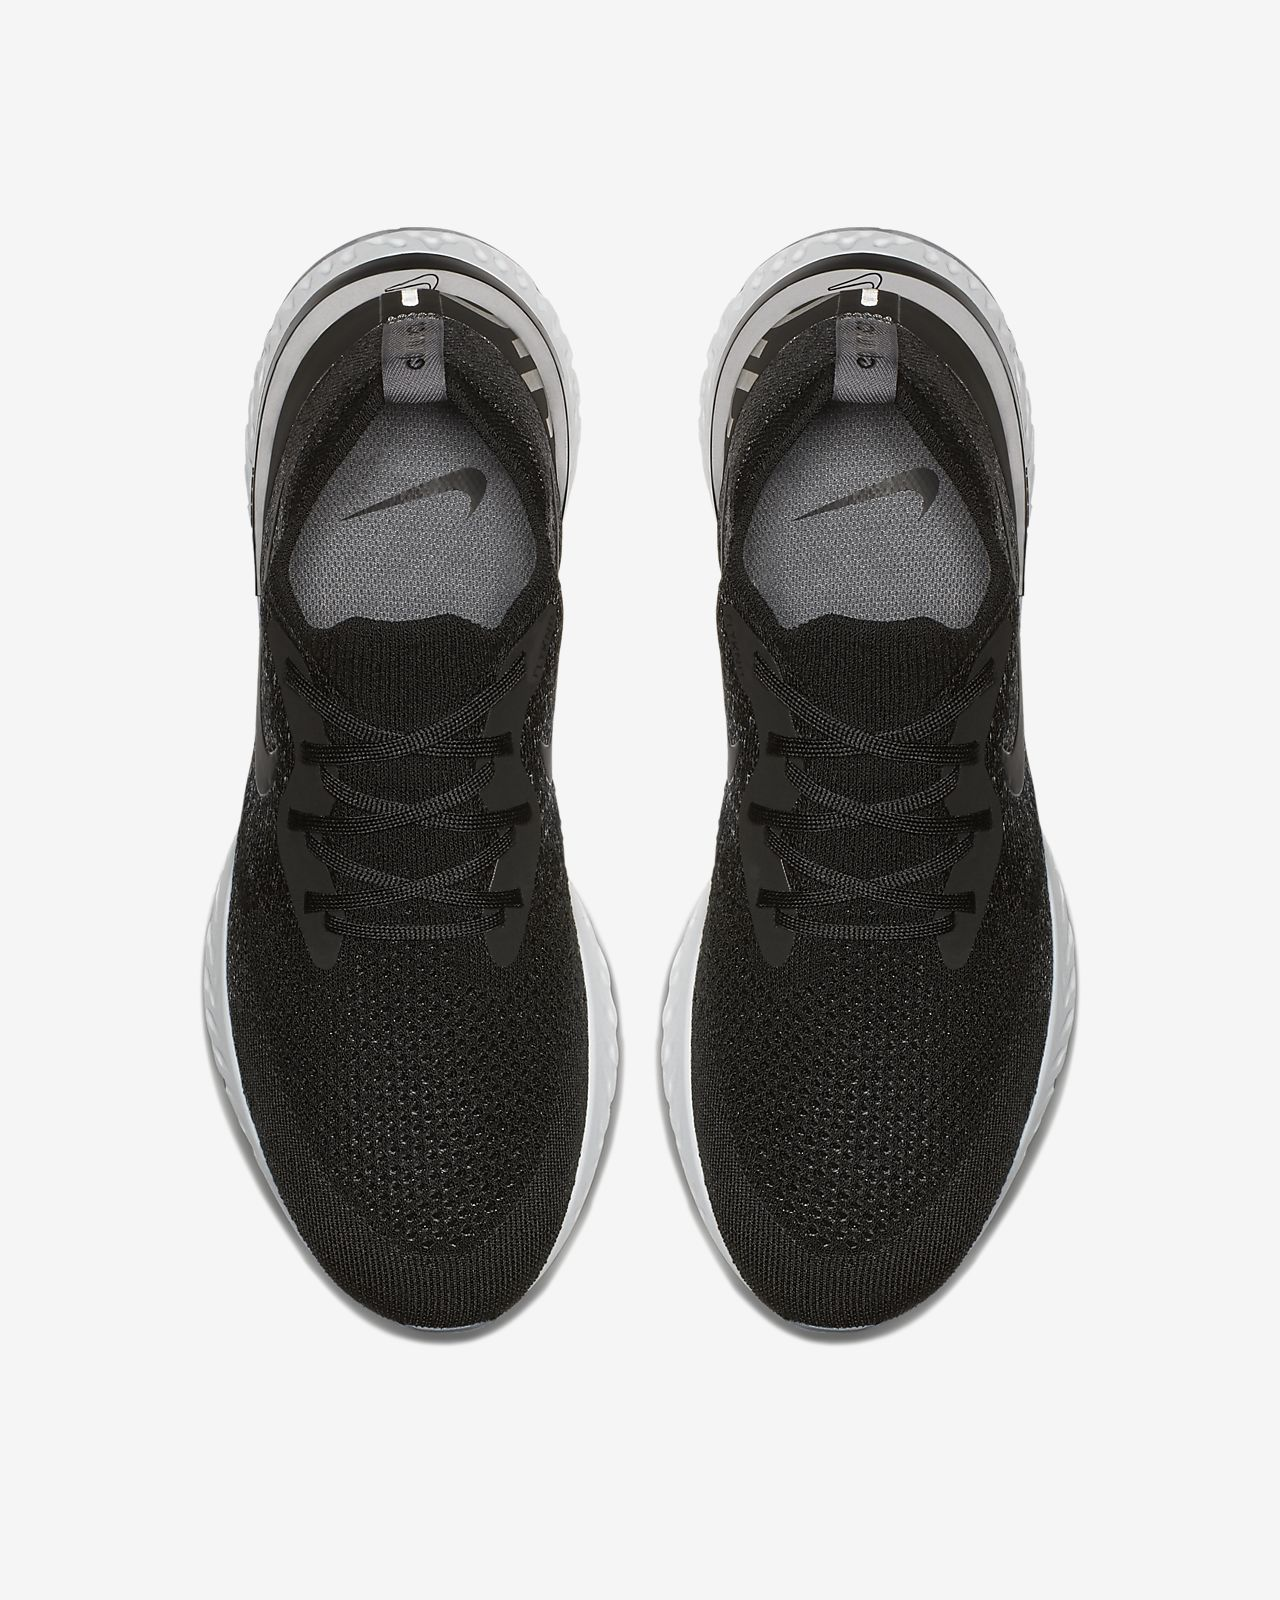 Nike Air Force 1 Mid WOLF GREY On Feet YouTube